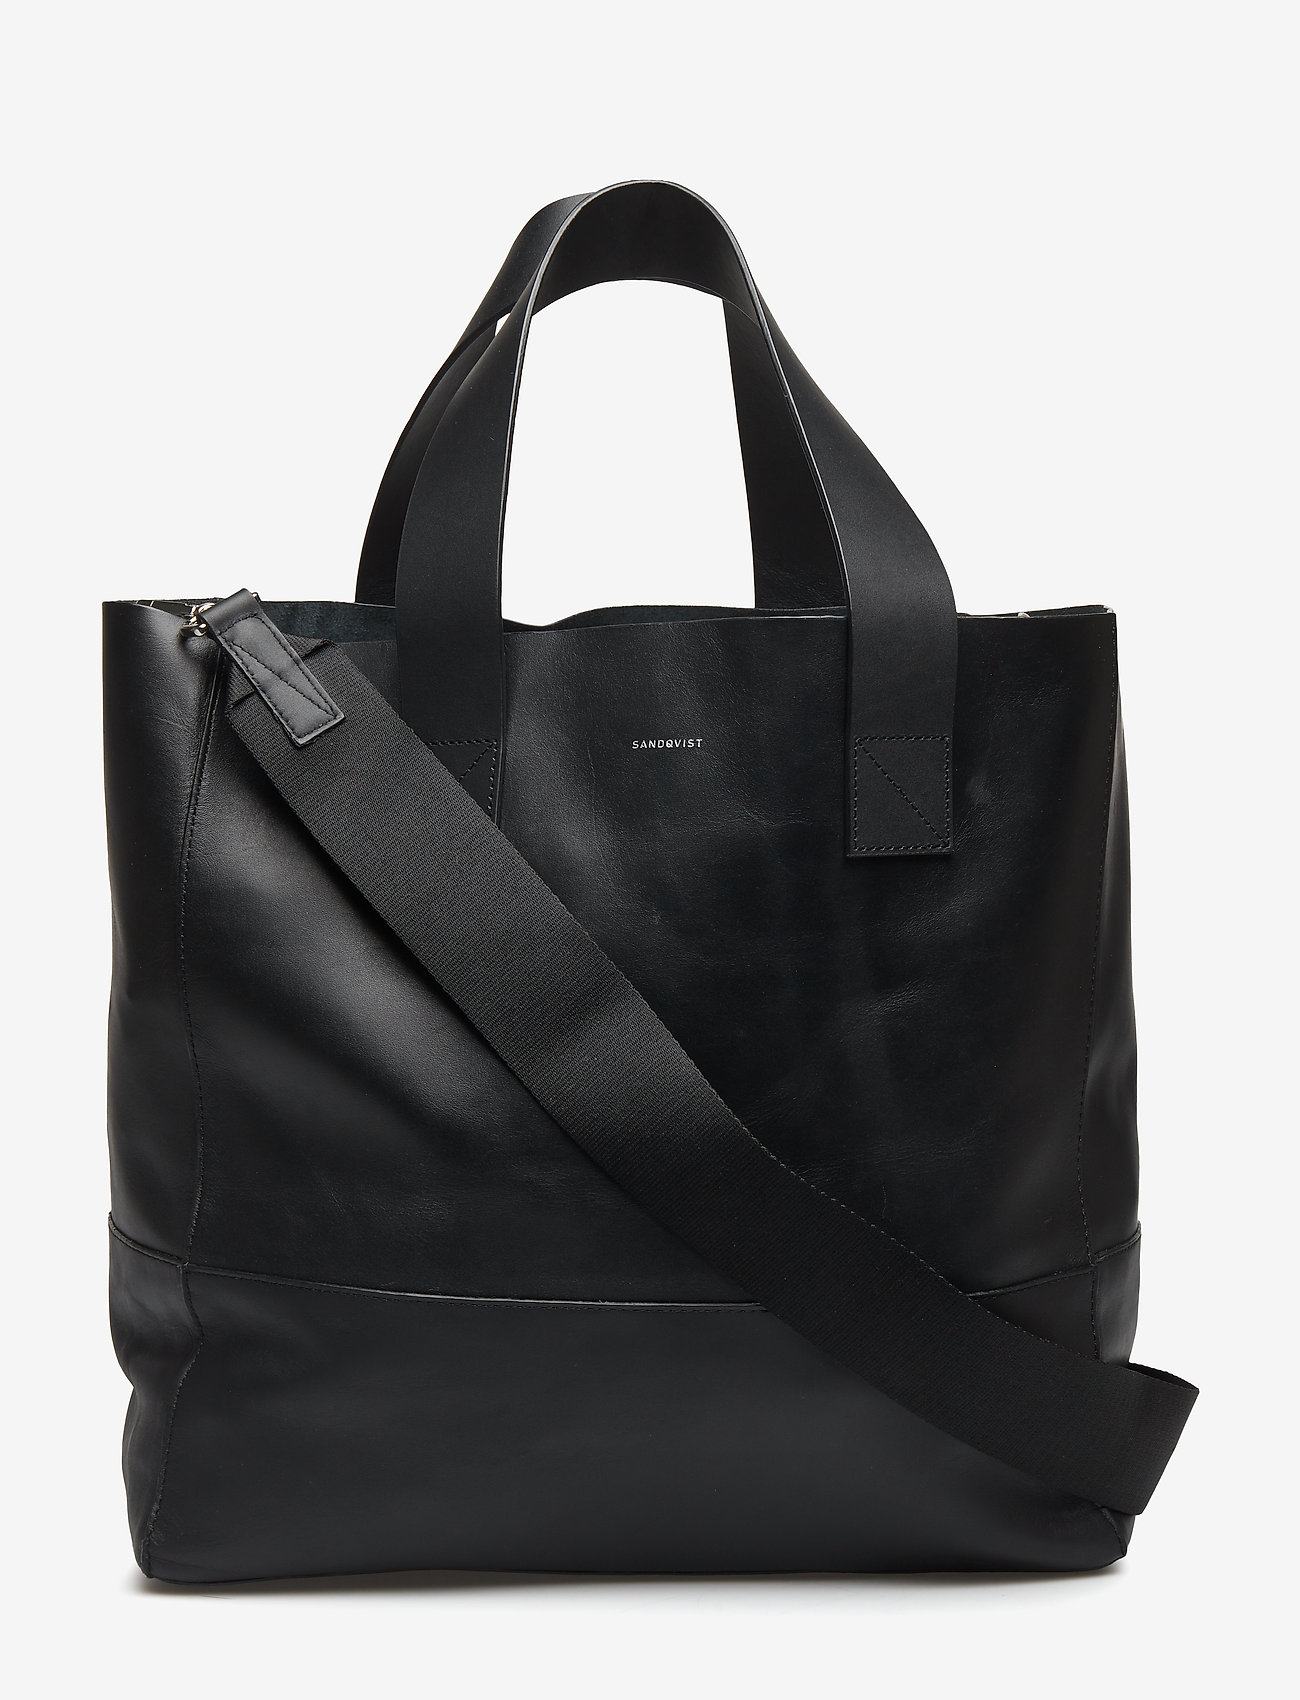 SANDQVIST - IRIS - shopping - black - 0